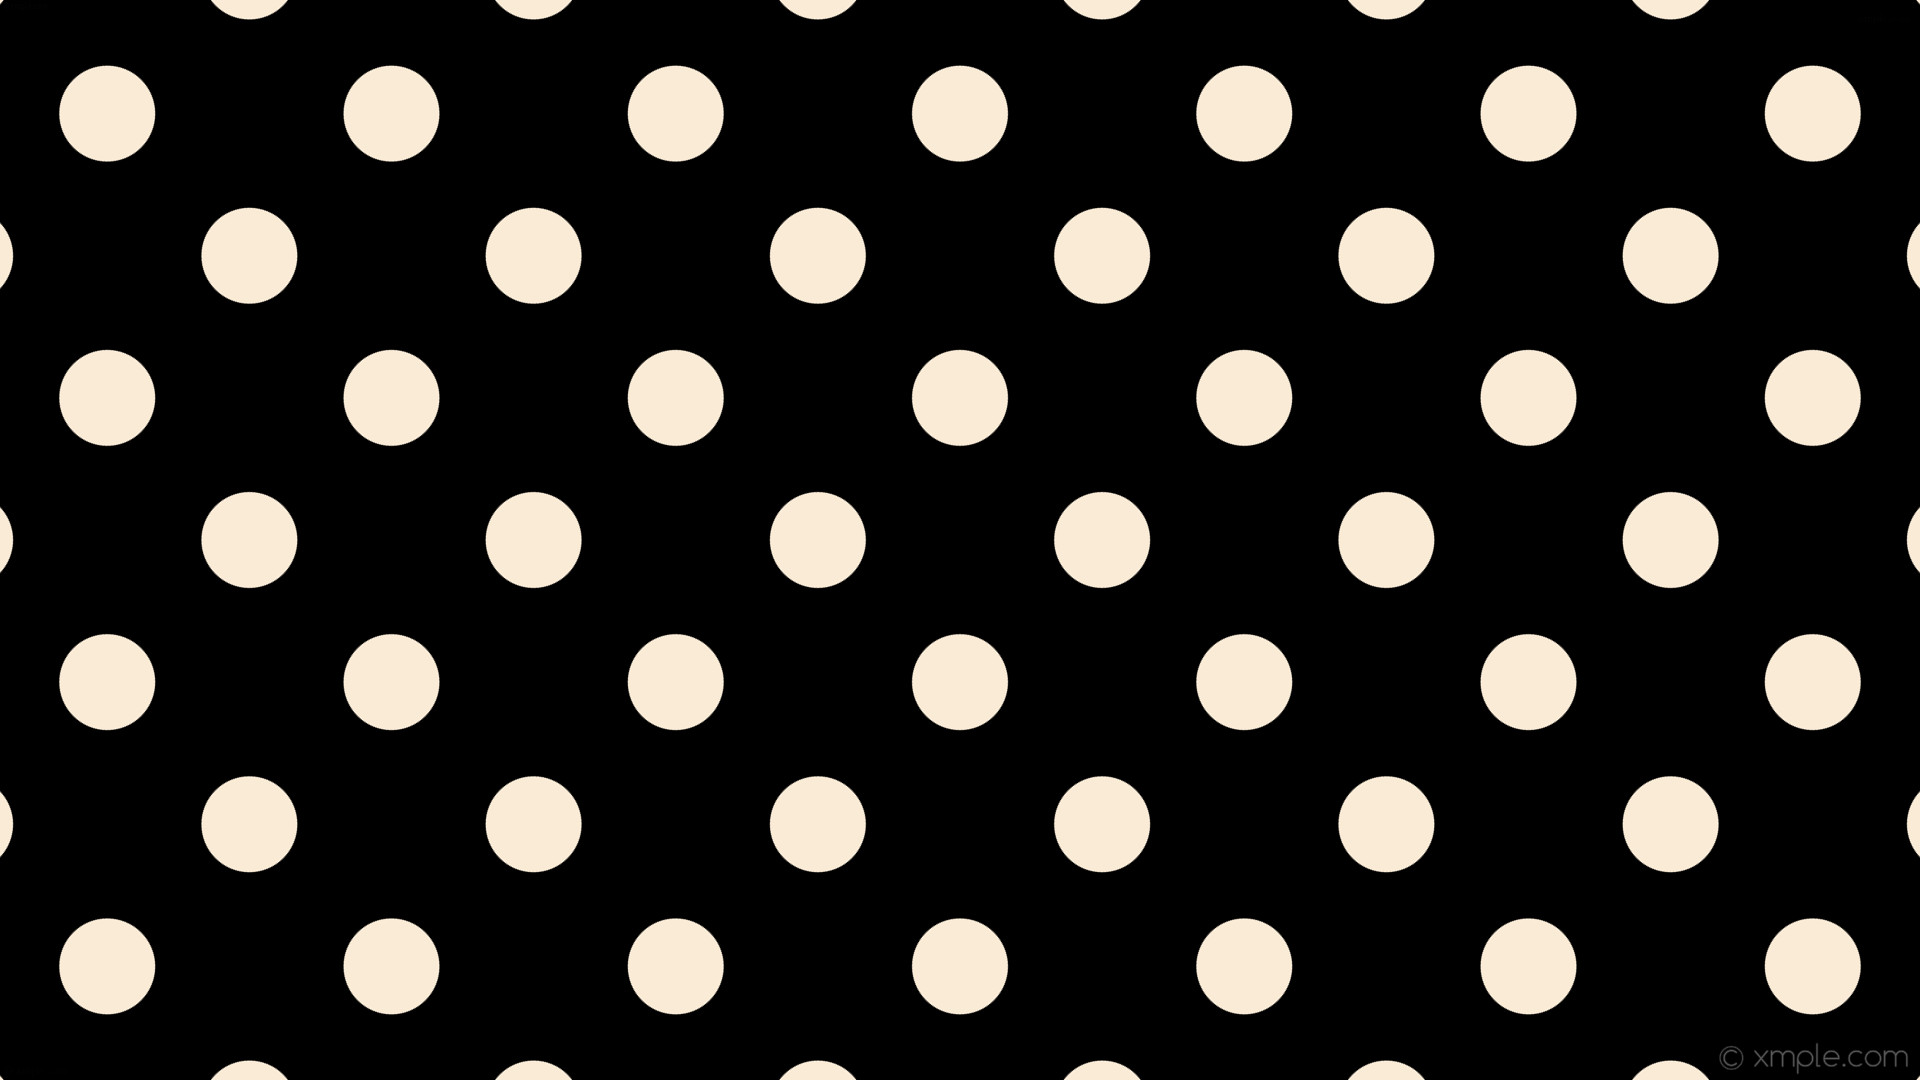 wallpaper dots white spots polka black antique white #000000 #faebd7 315°  96px 201px